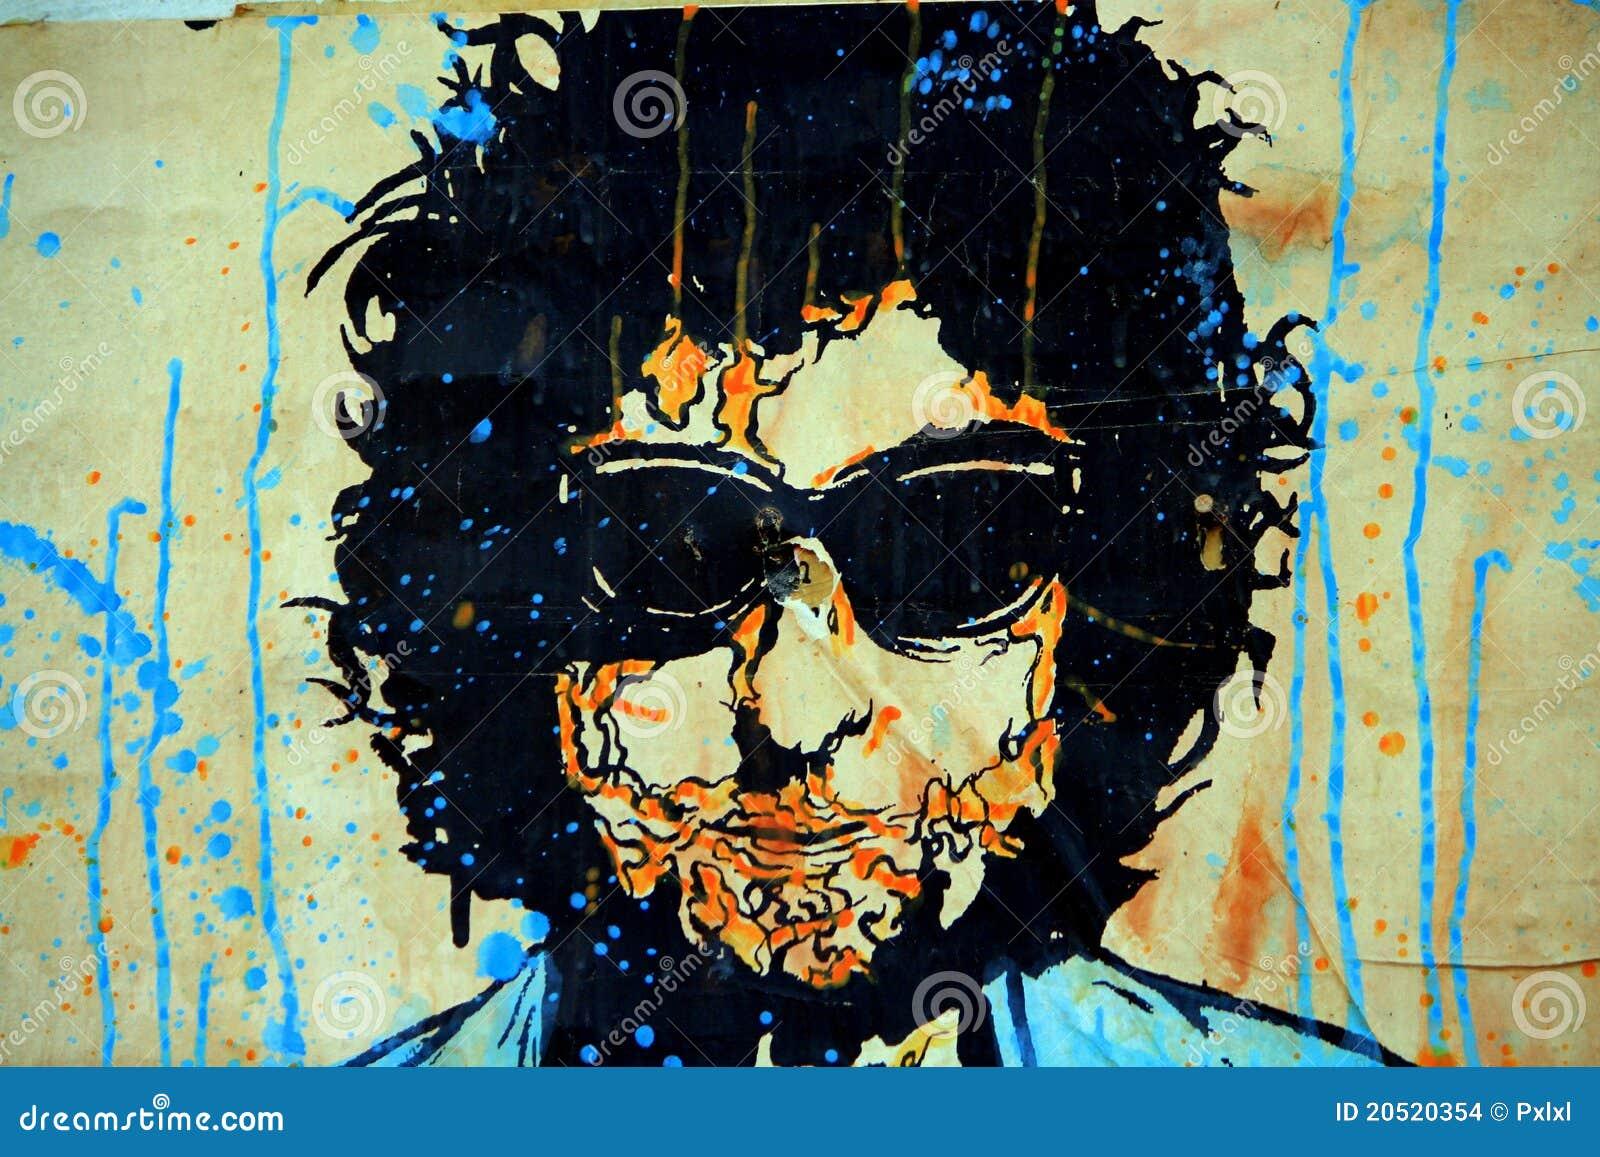 Bob Dylan graffiti art